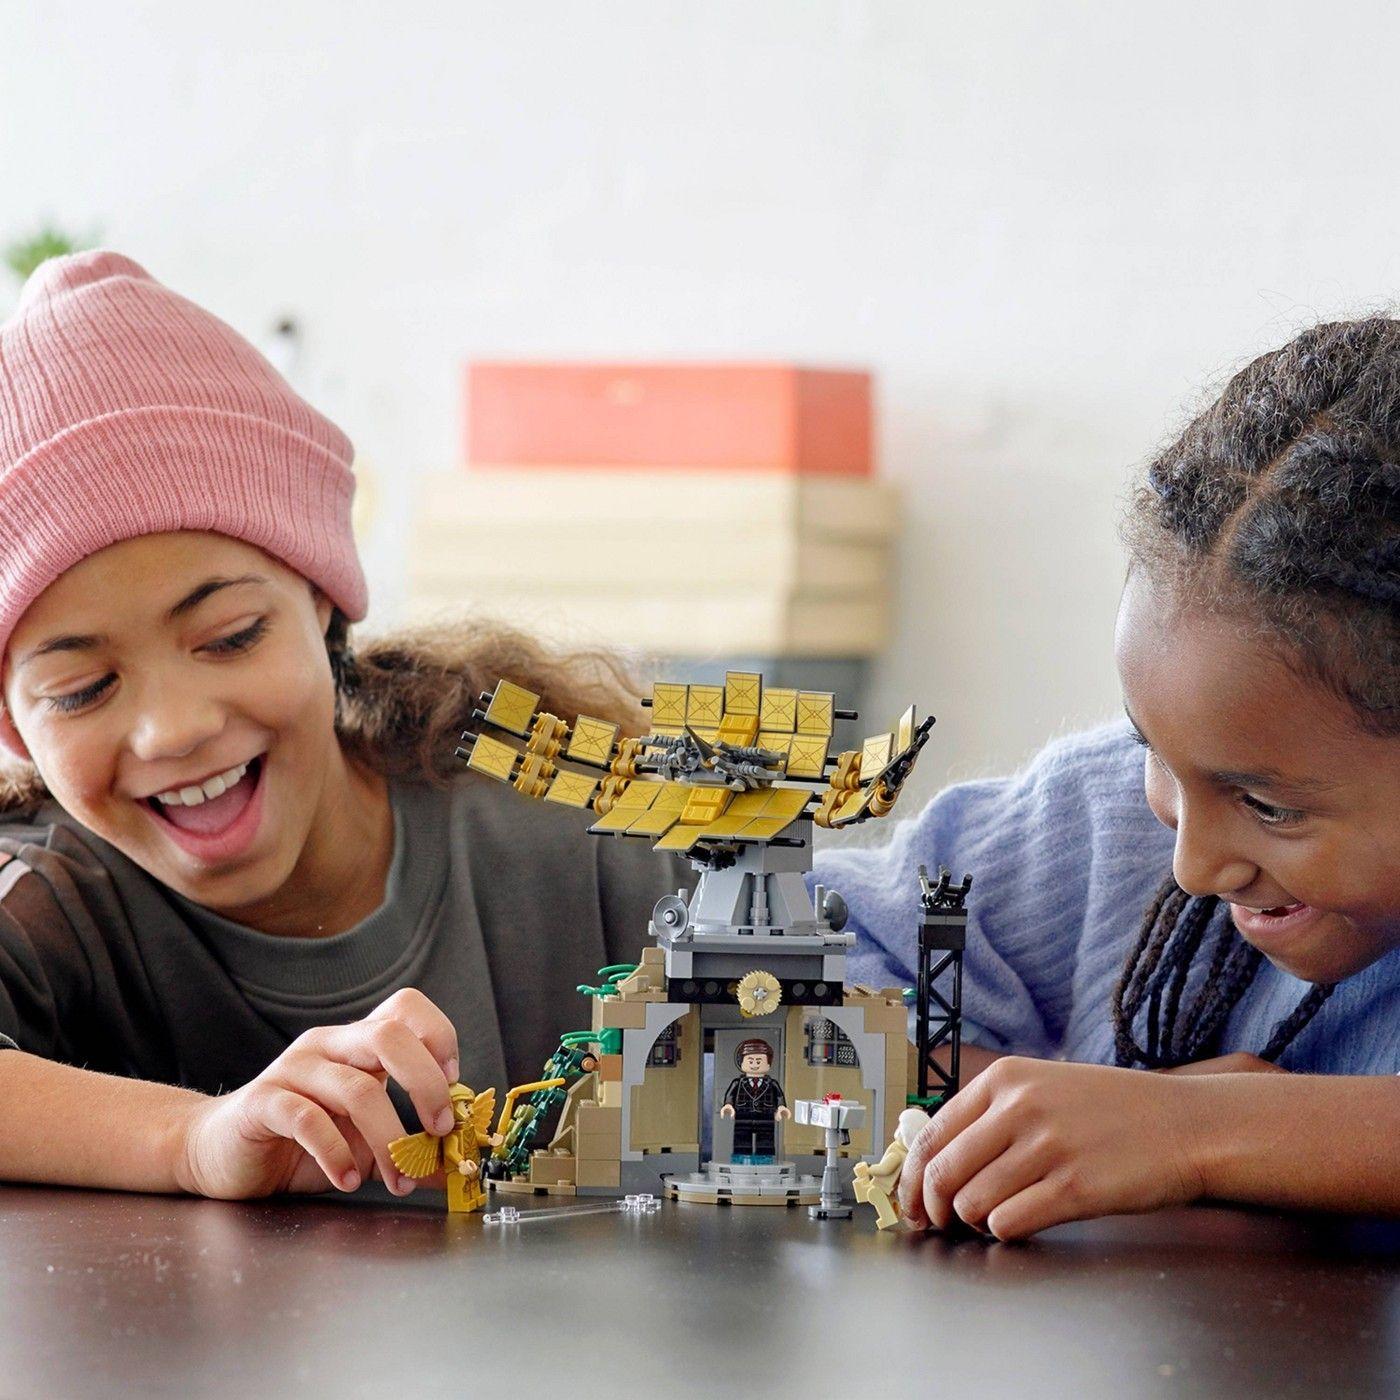 Lego Dc Wonder Woman Vs Cheetah Building Kit 76157 In 2020 Lego Super Heroes Lego Dc Wonder Woman Vs Cheetah